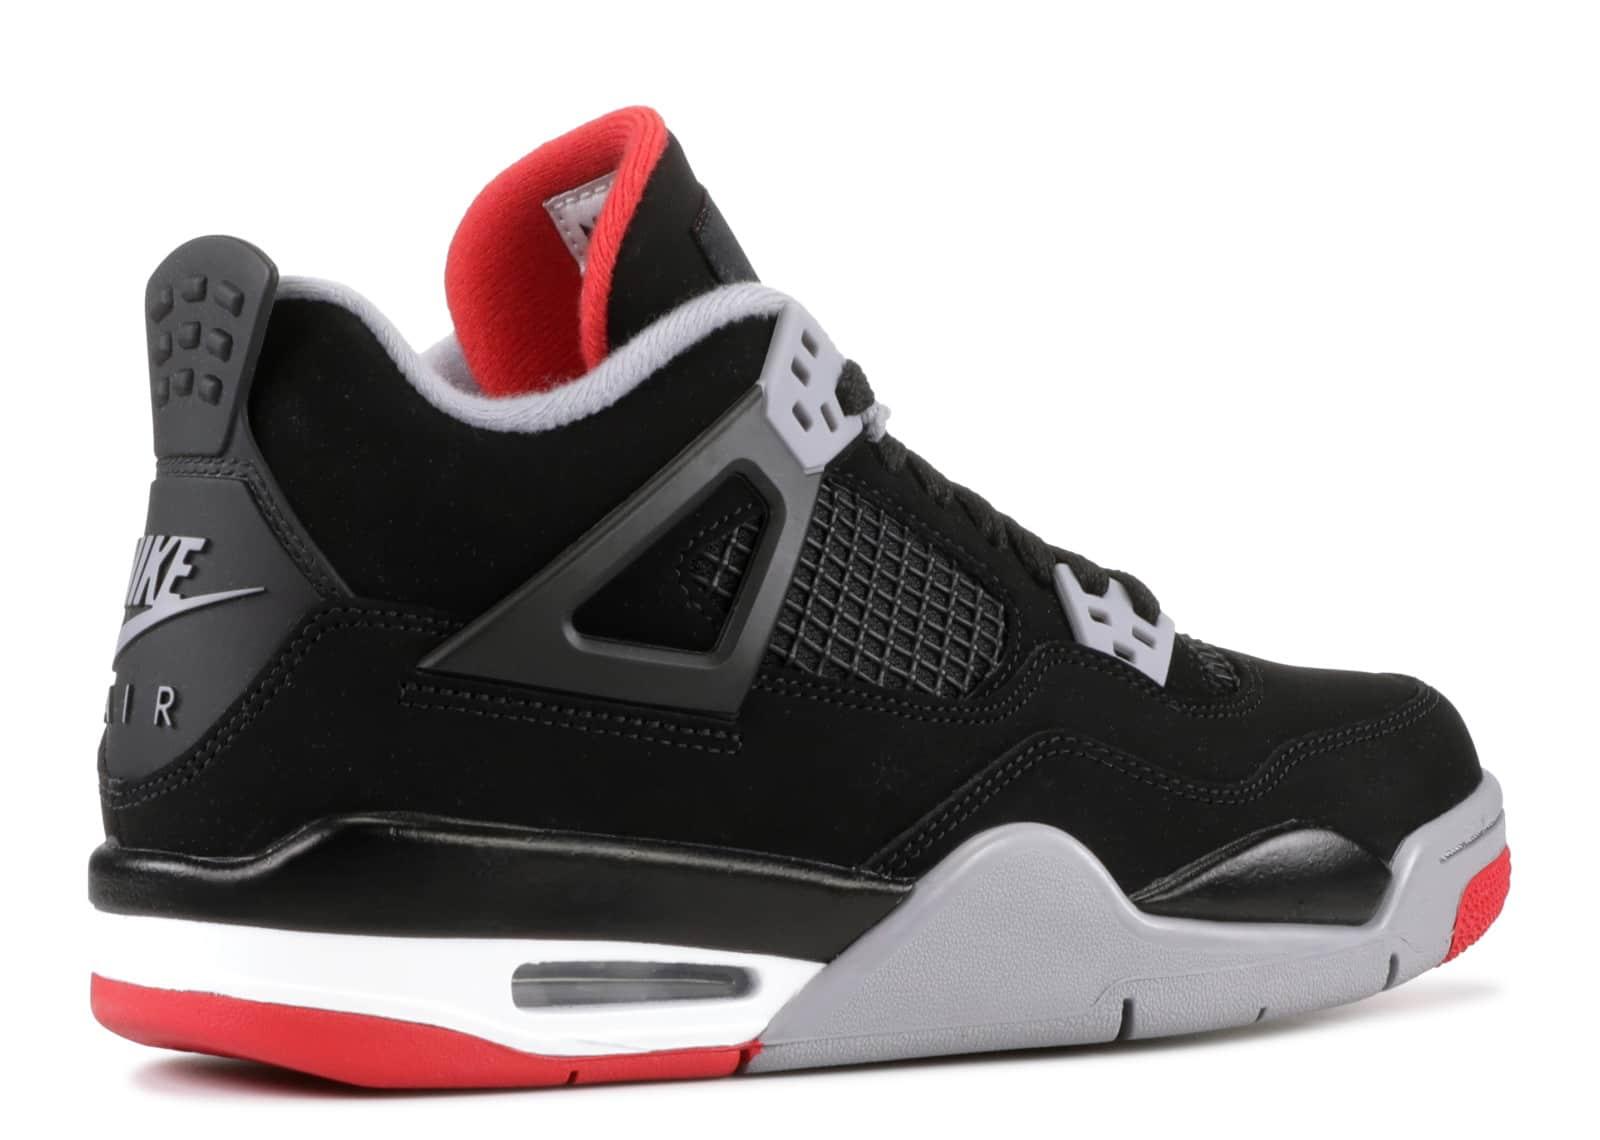 official photos 90285 347d0 Air Jordan 4 Retro Bred 2019 (GS)